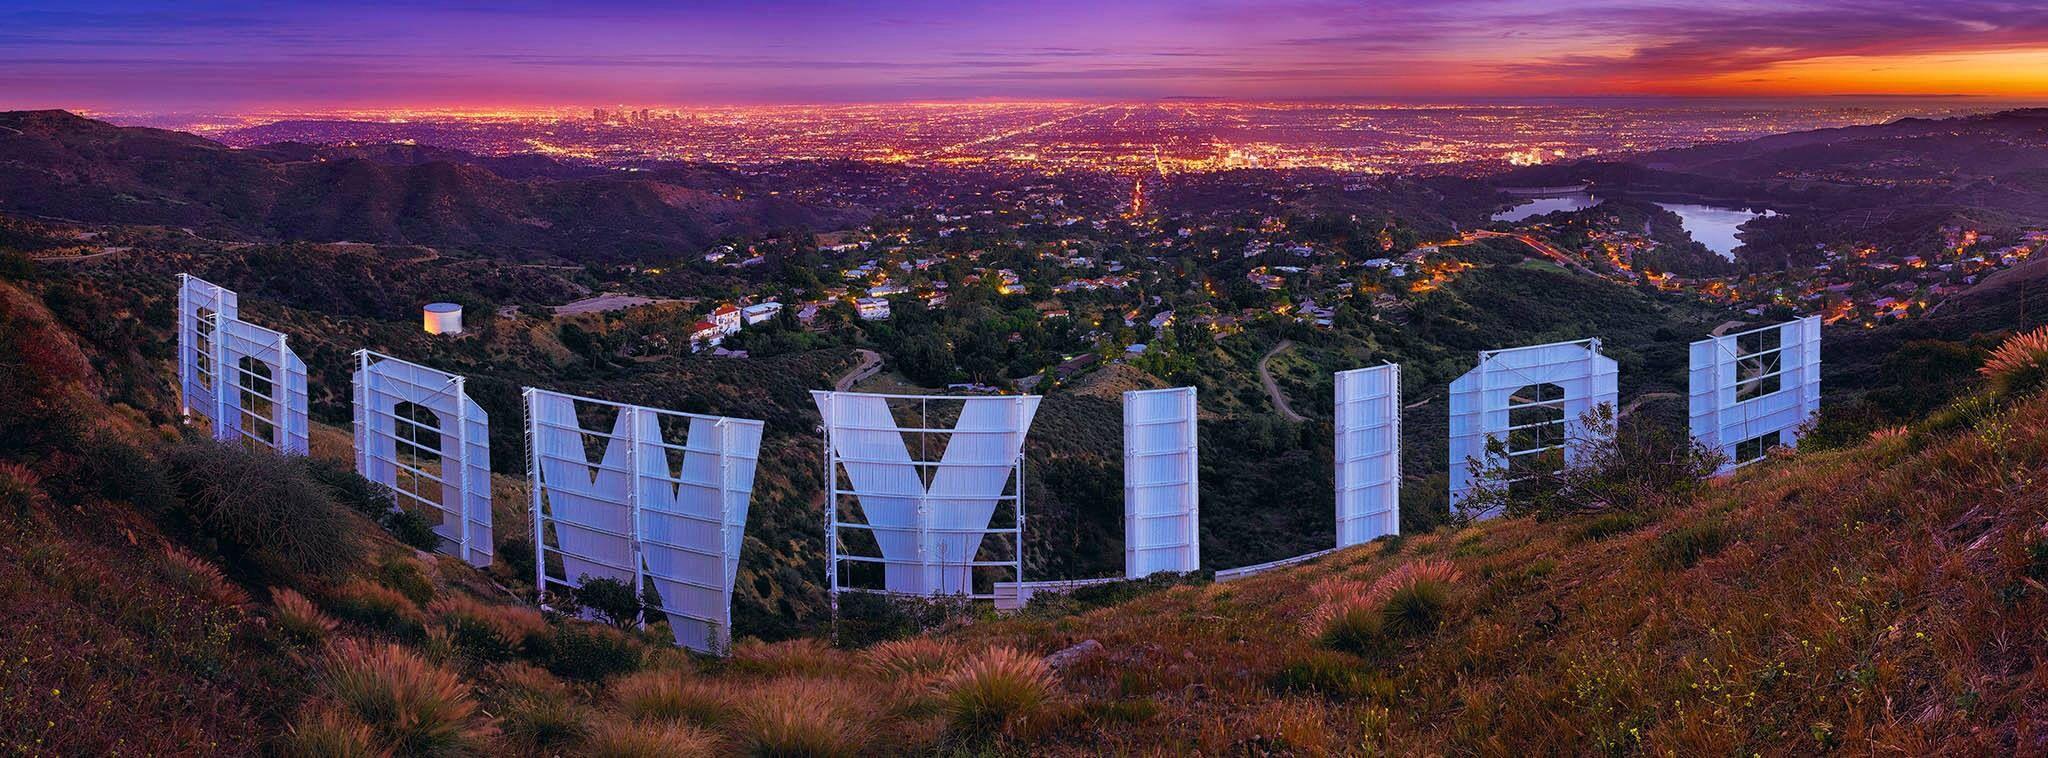 Hollywood Nights Peter Lik